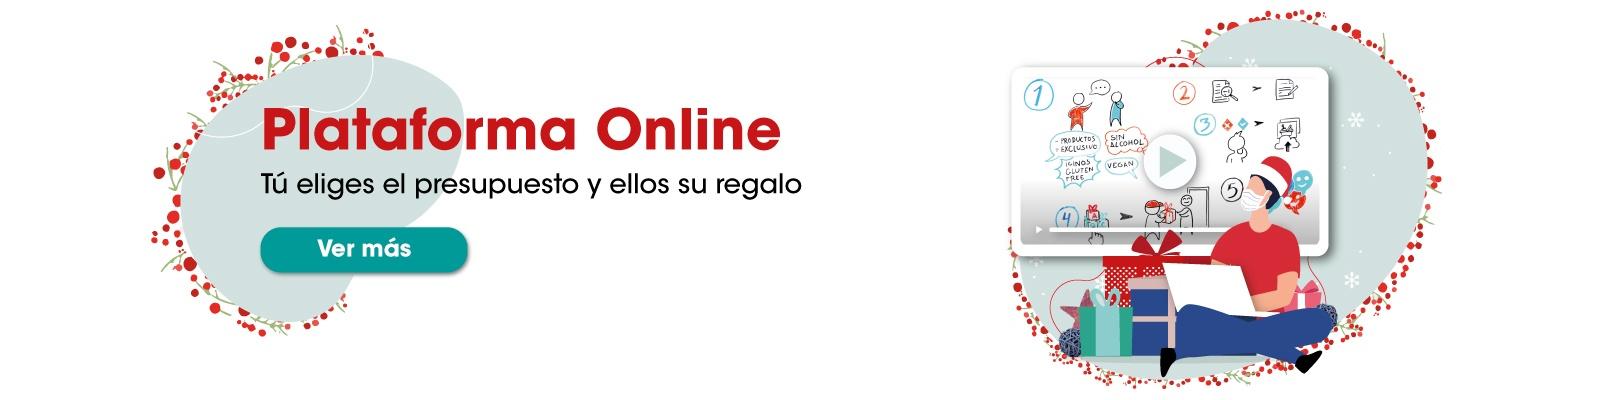 Plataforma Online Incentiva